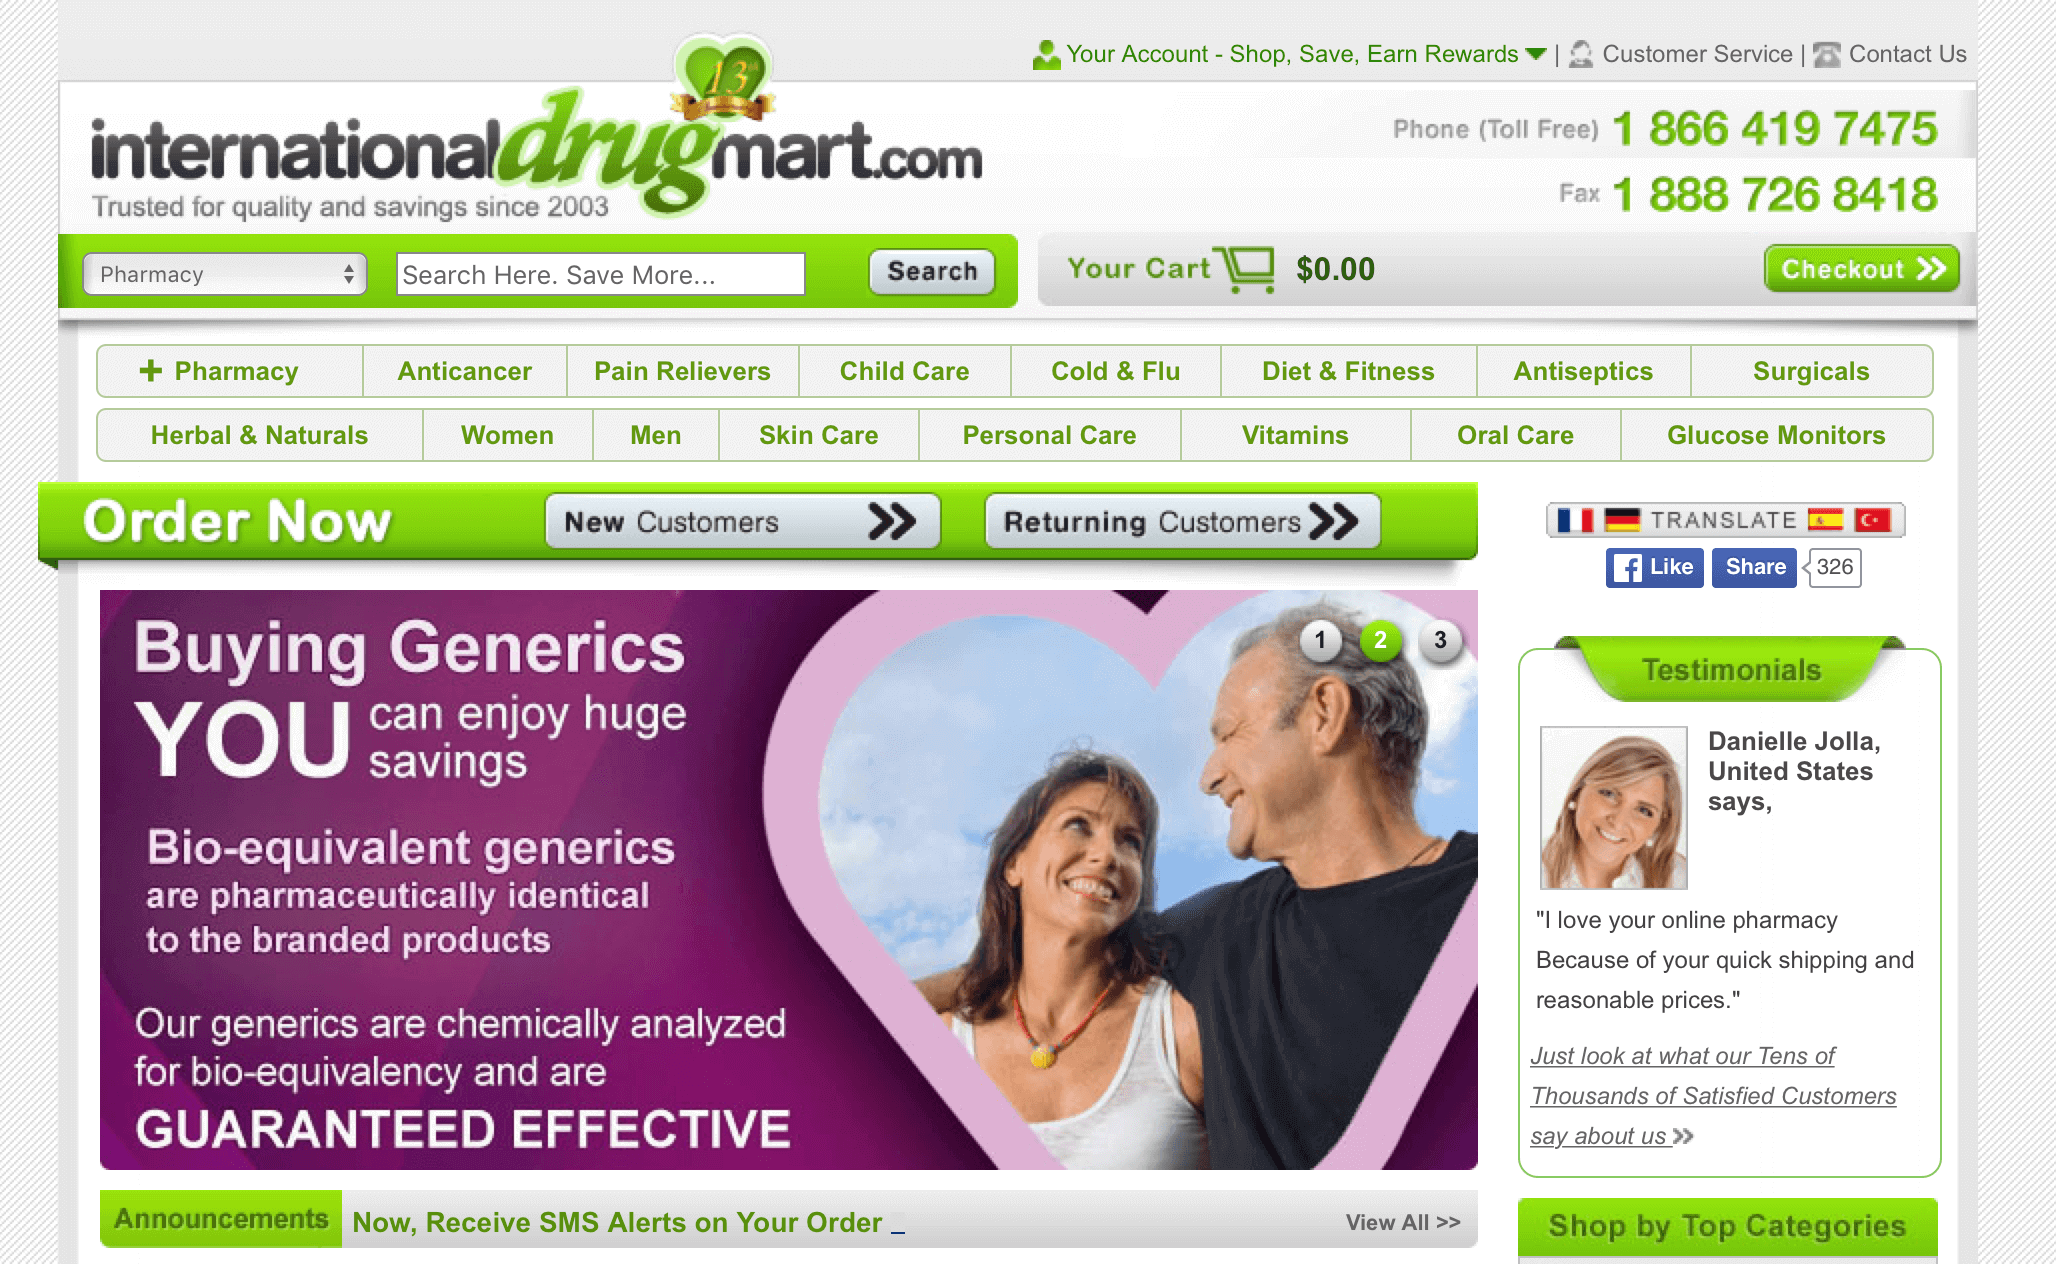 InternationalDrugMart.com Pharmacy Review